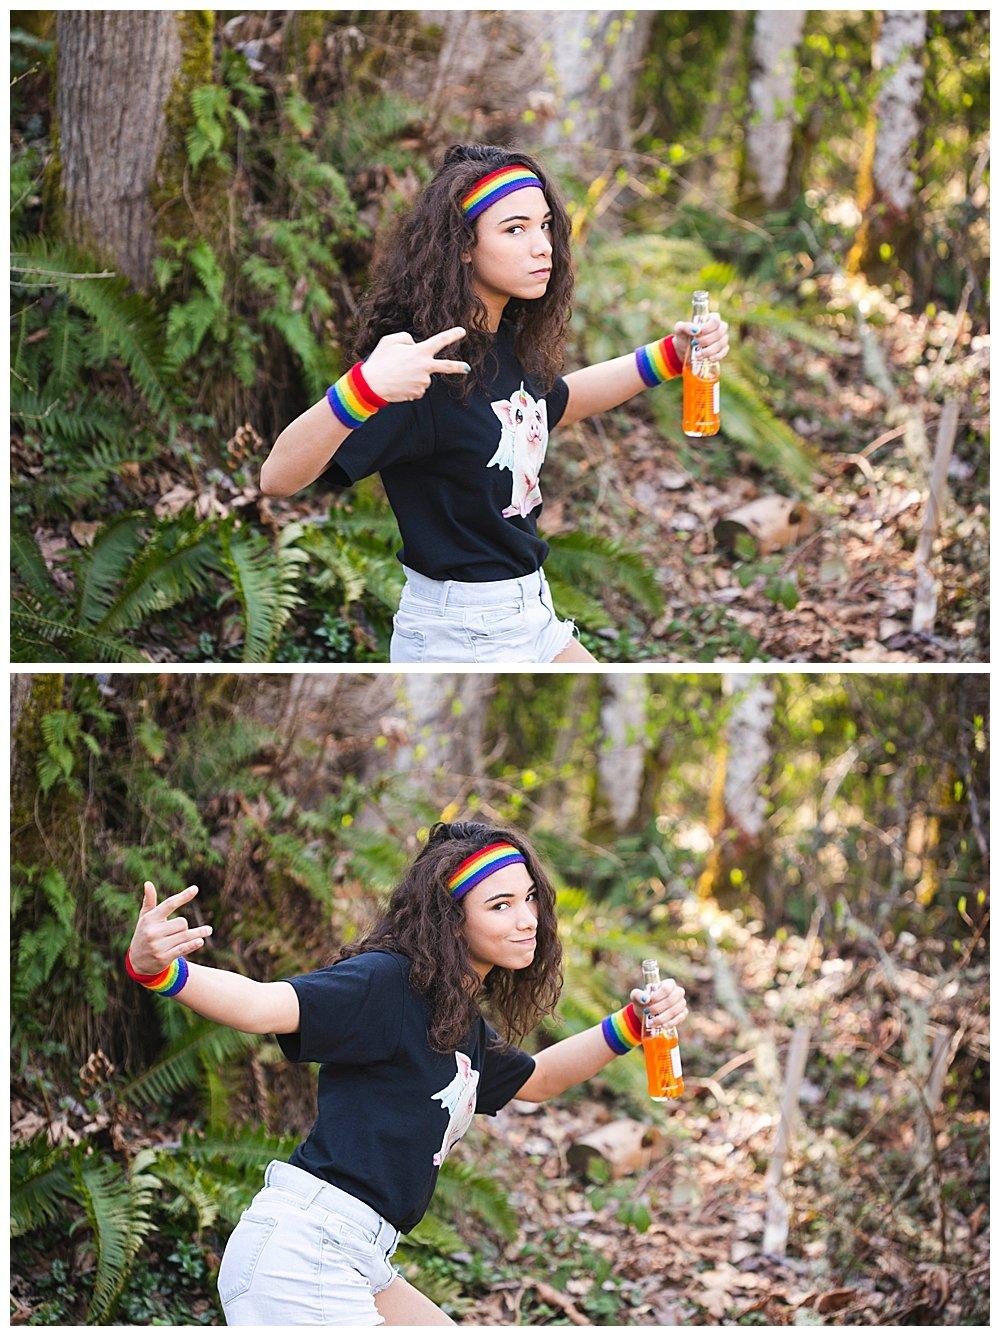 Avi posing in the woods.